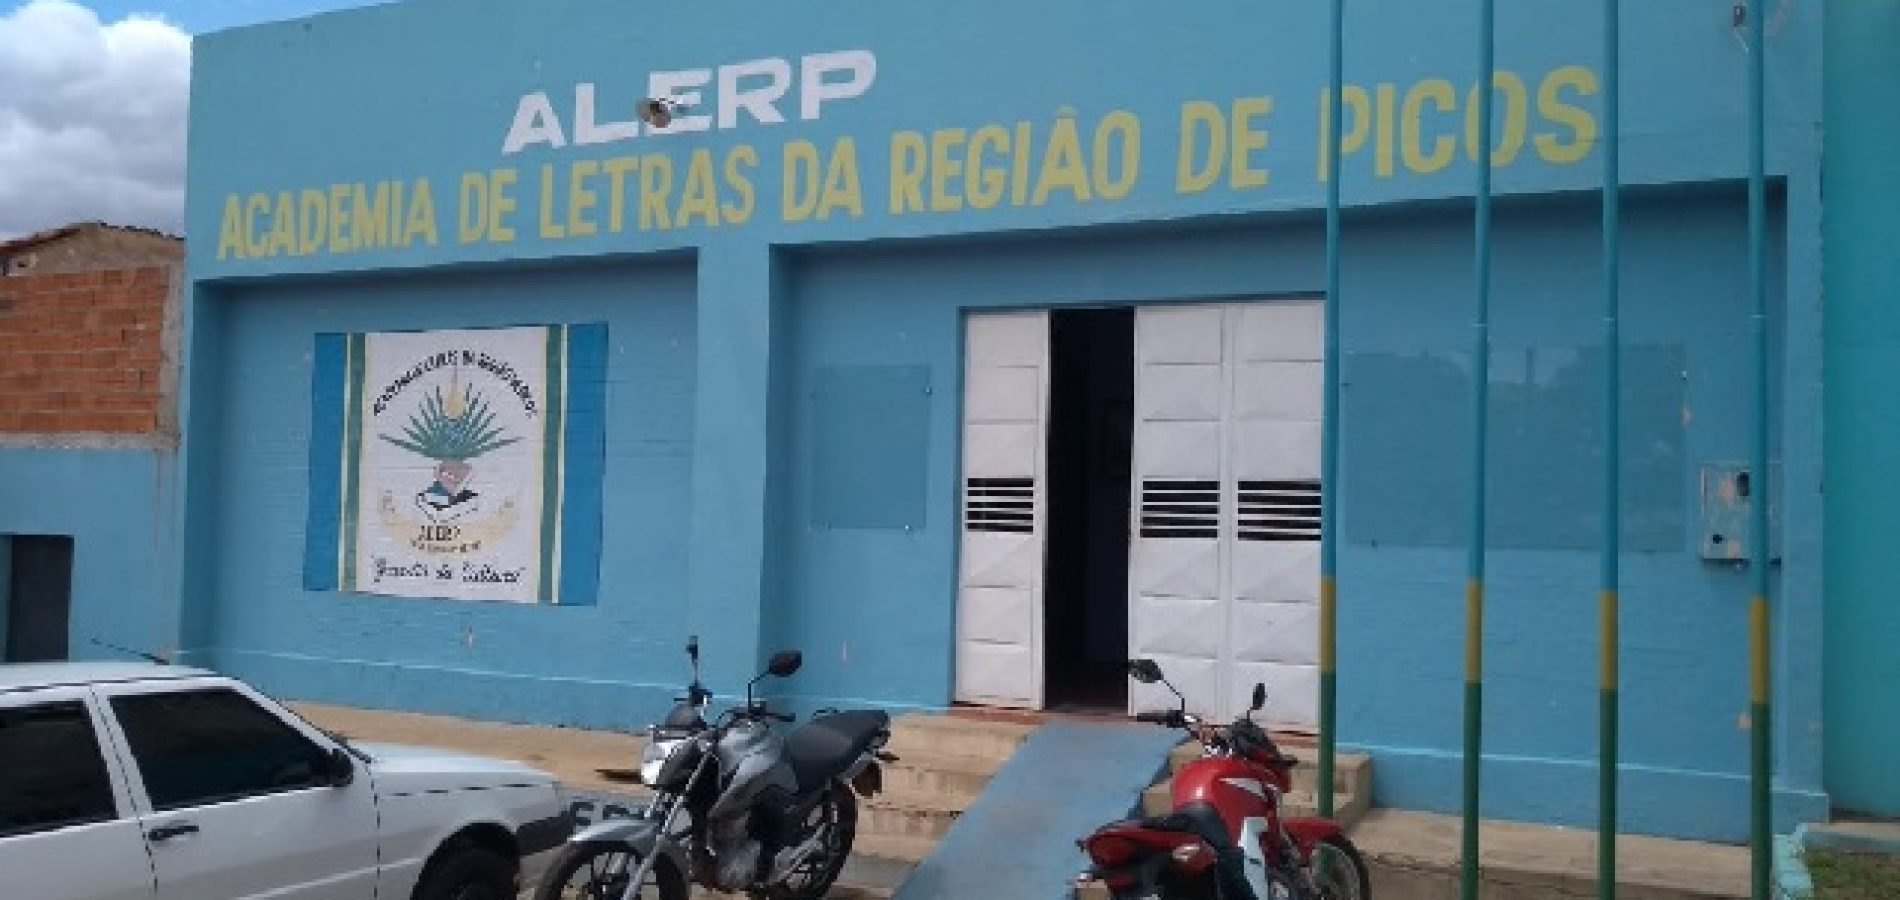 ALERP promove I Semana de Artes Plásticas de Picos